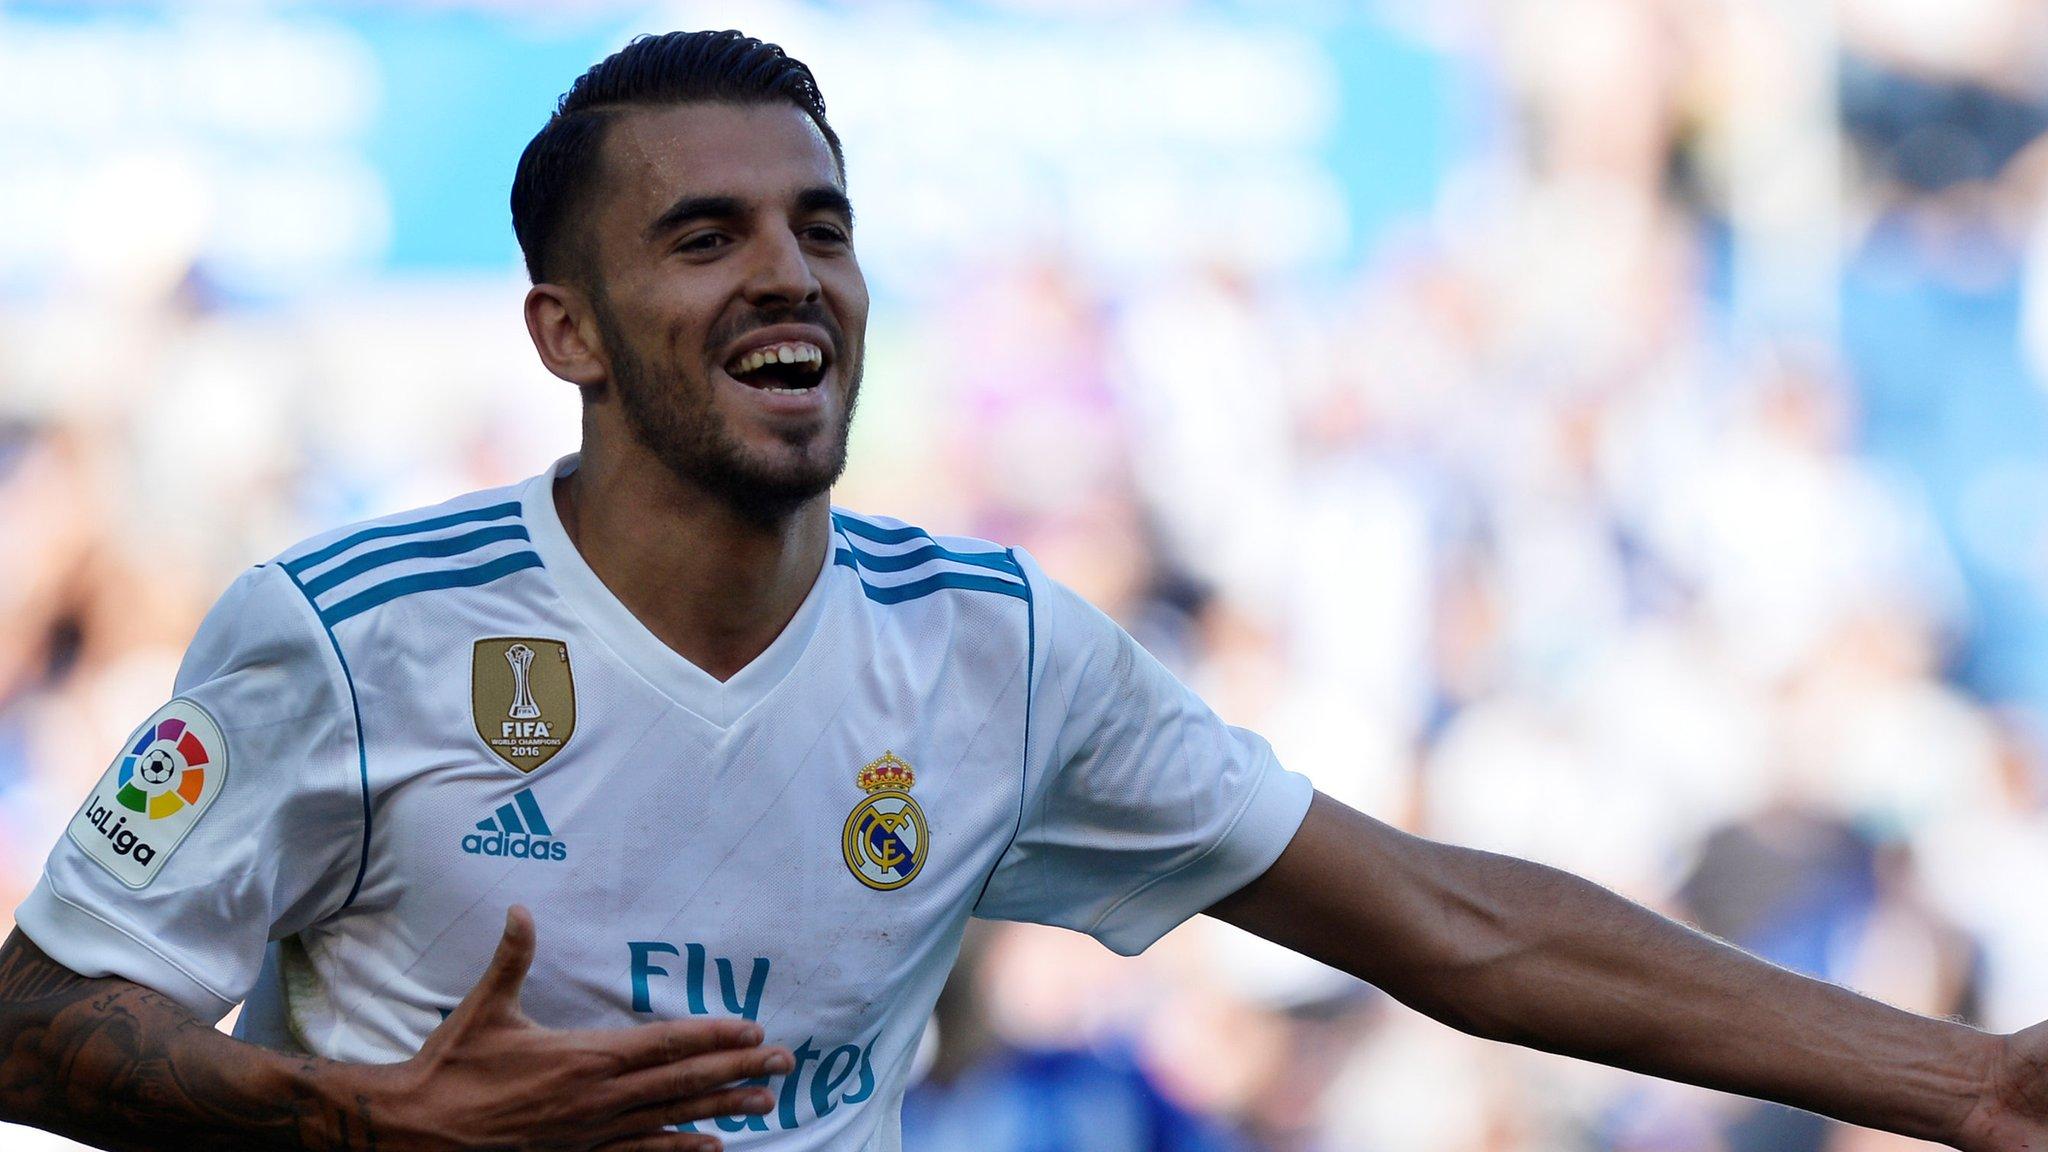 Ceballos scores twice as Real Madrid beat Alaves